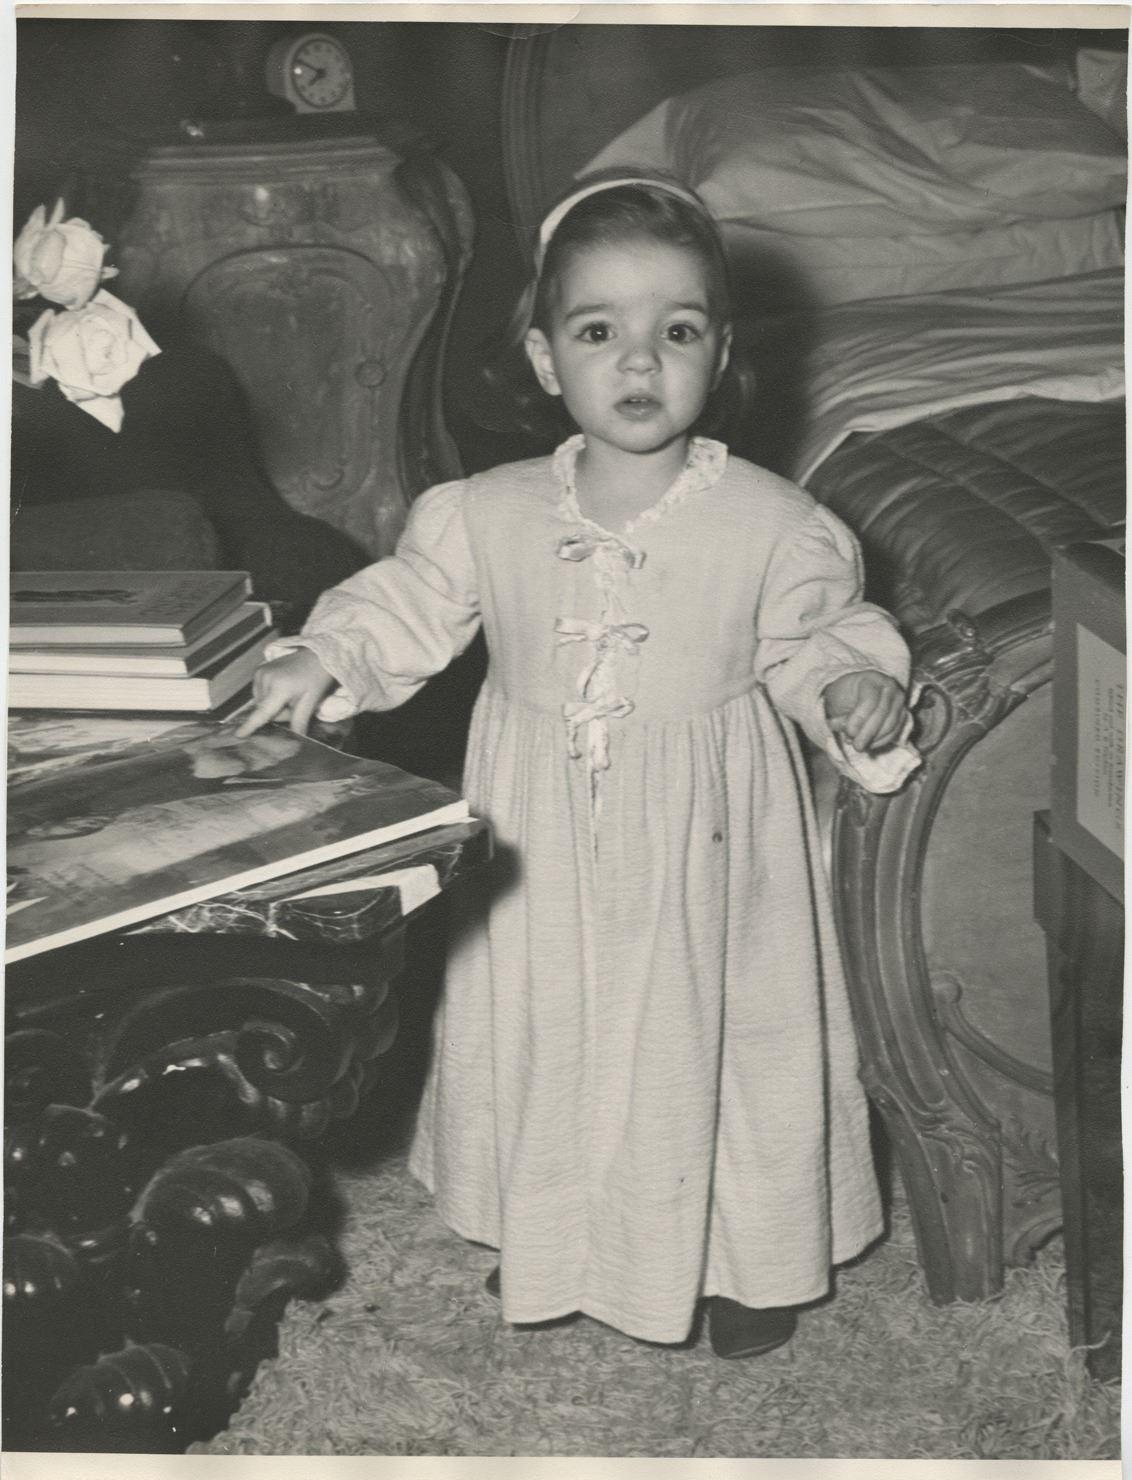 Liza Minnelli (2) childhood oversize portrait photographs